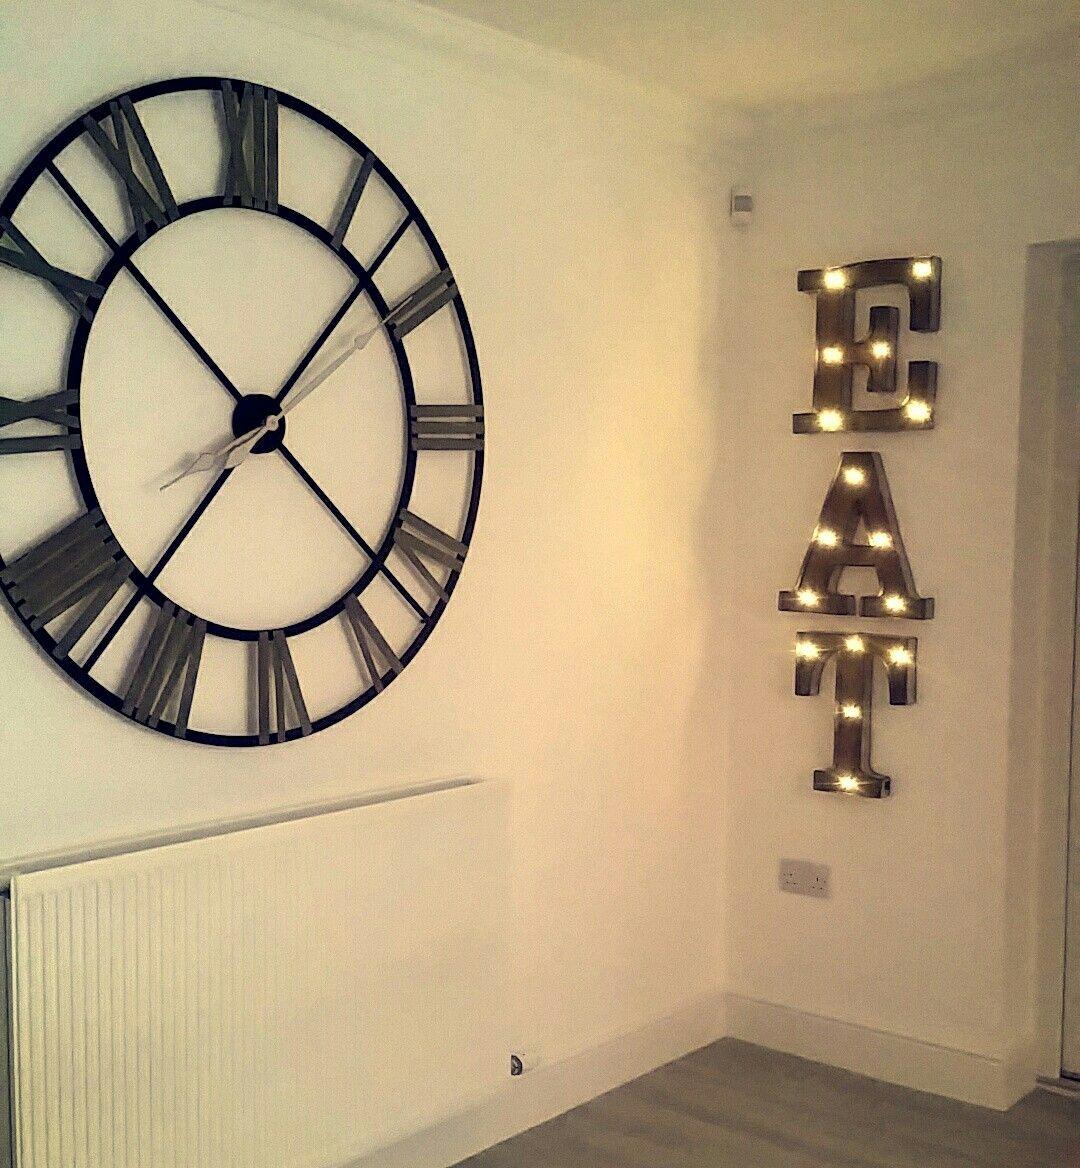 Large wall clock light up signs | CLOCK DECOR | Pinterest | Wall ...